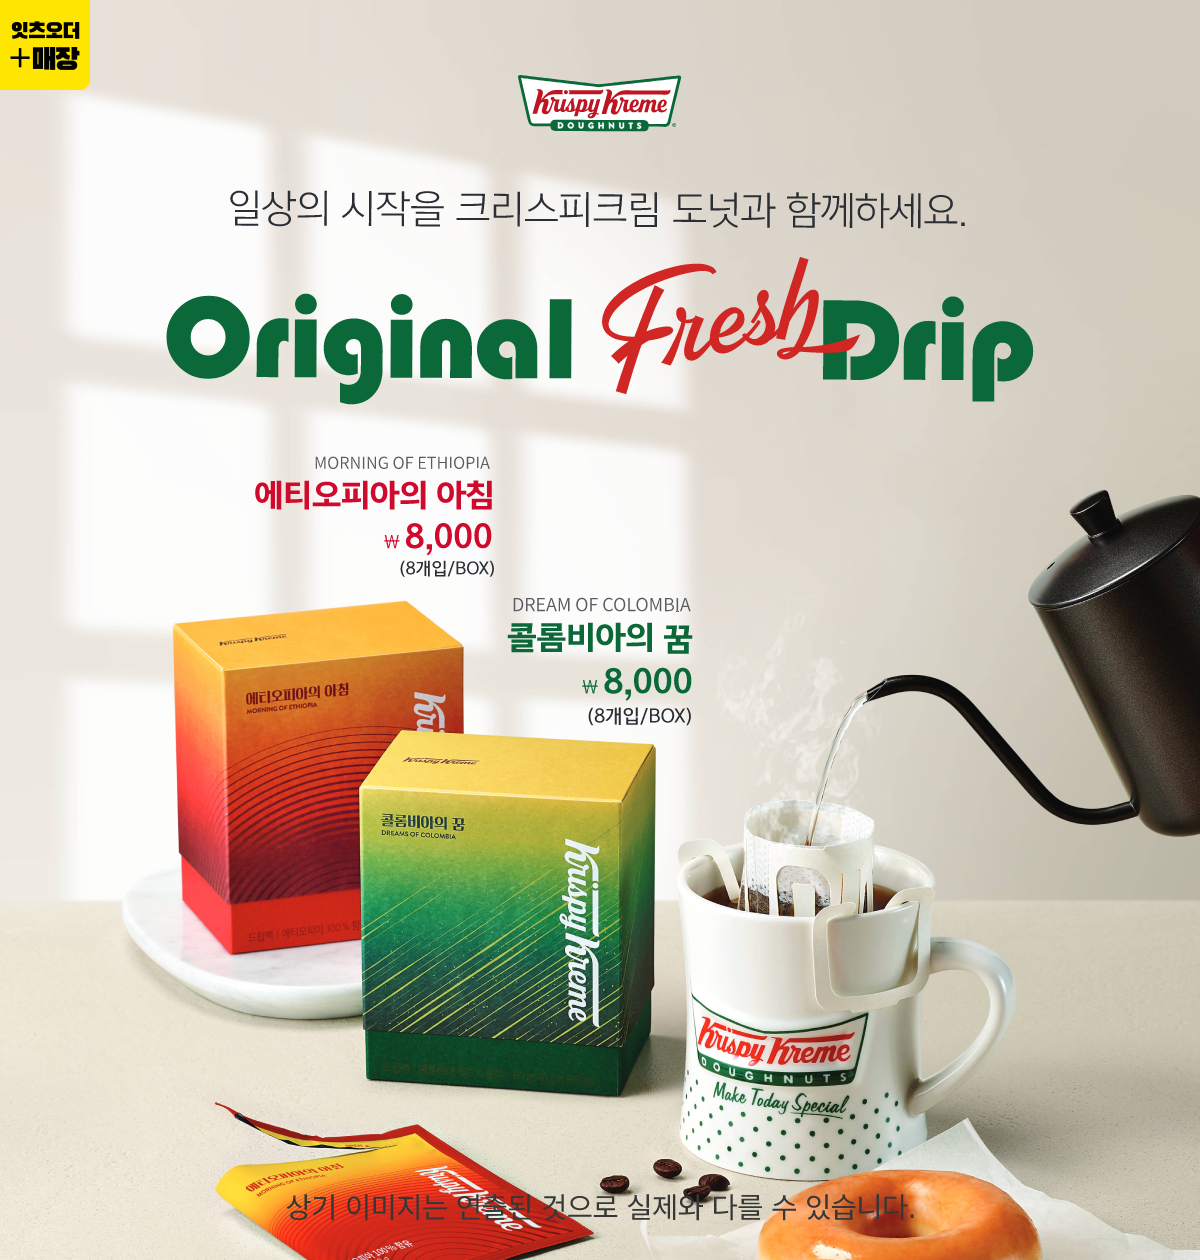 Original Fresh Drip